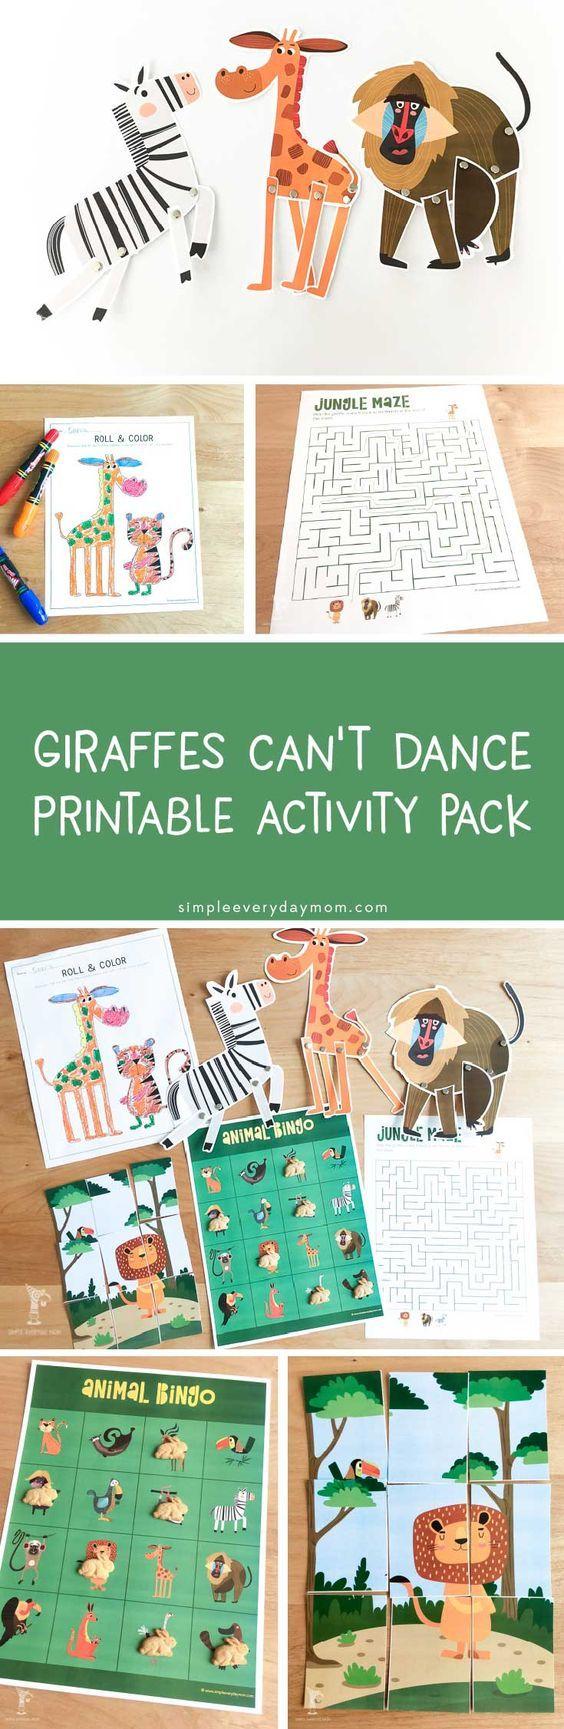 70 best Preschool lesson plan ideas images on Pinterest | Preschool ...